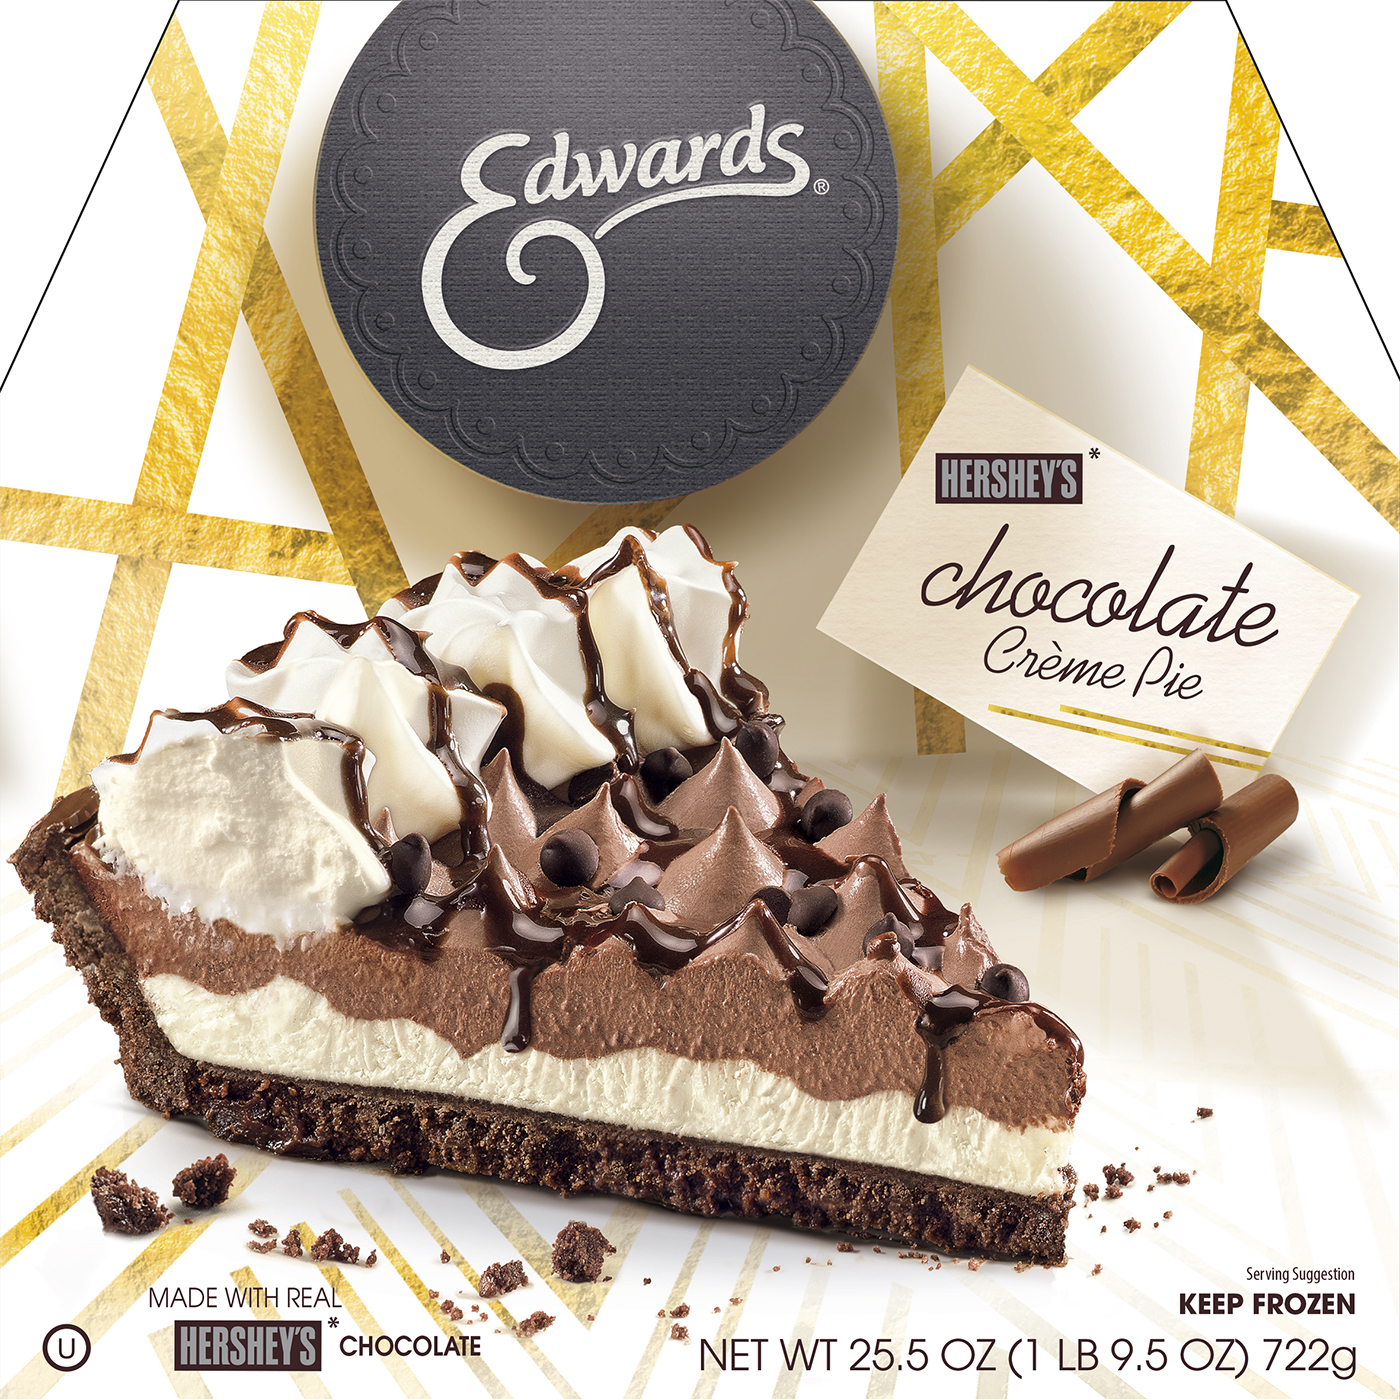 Edwards Hershey chocolate cream pie